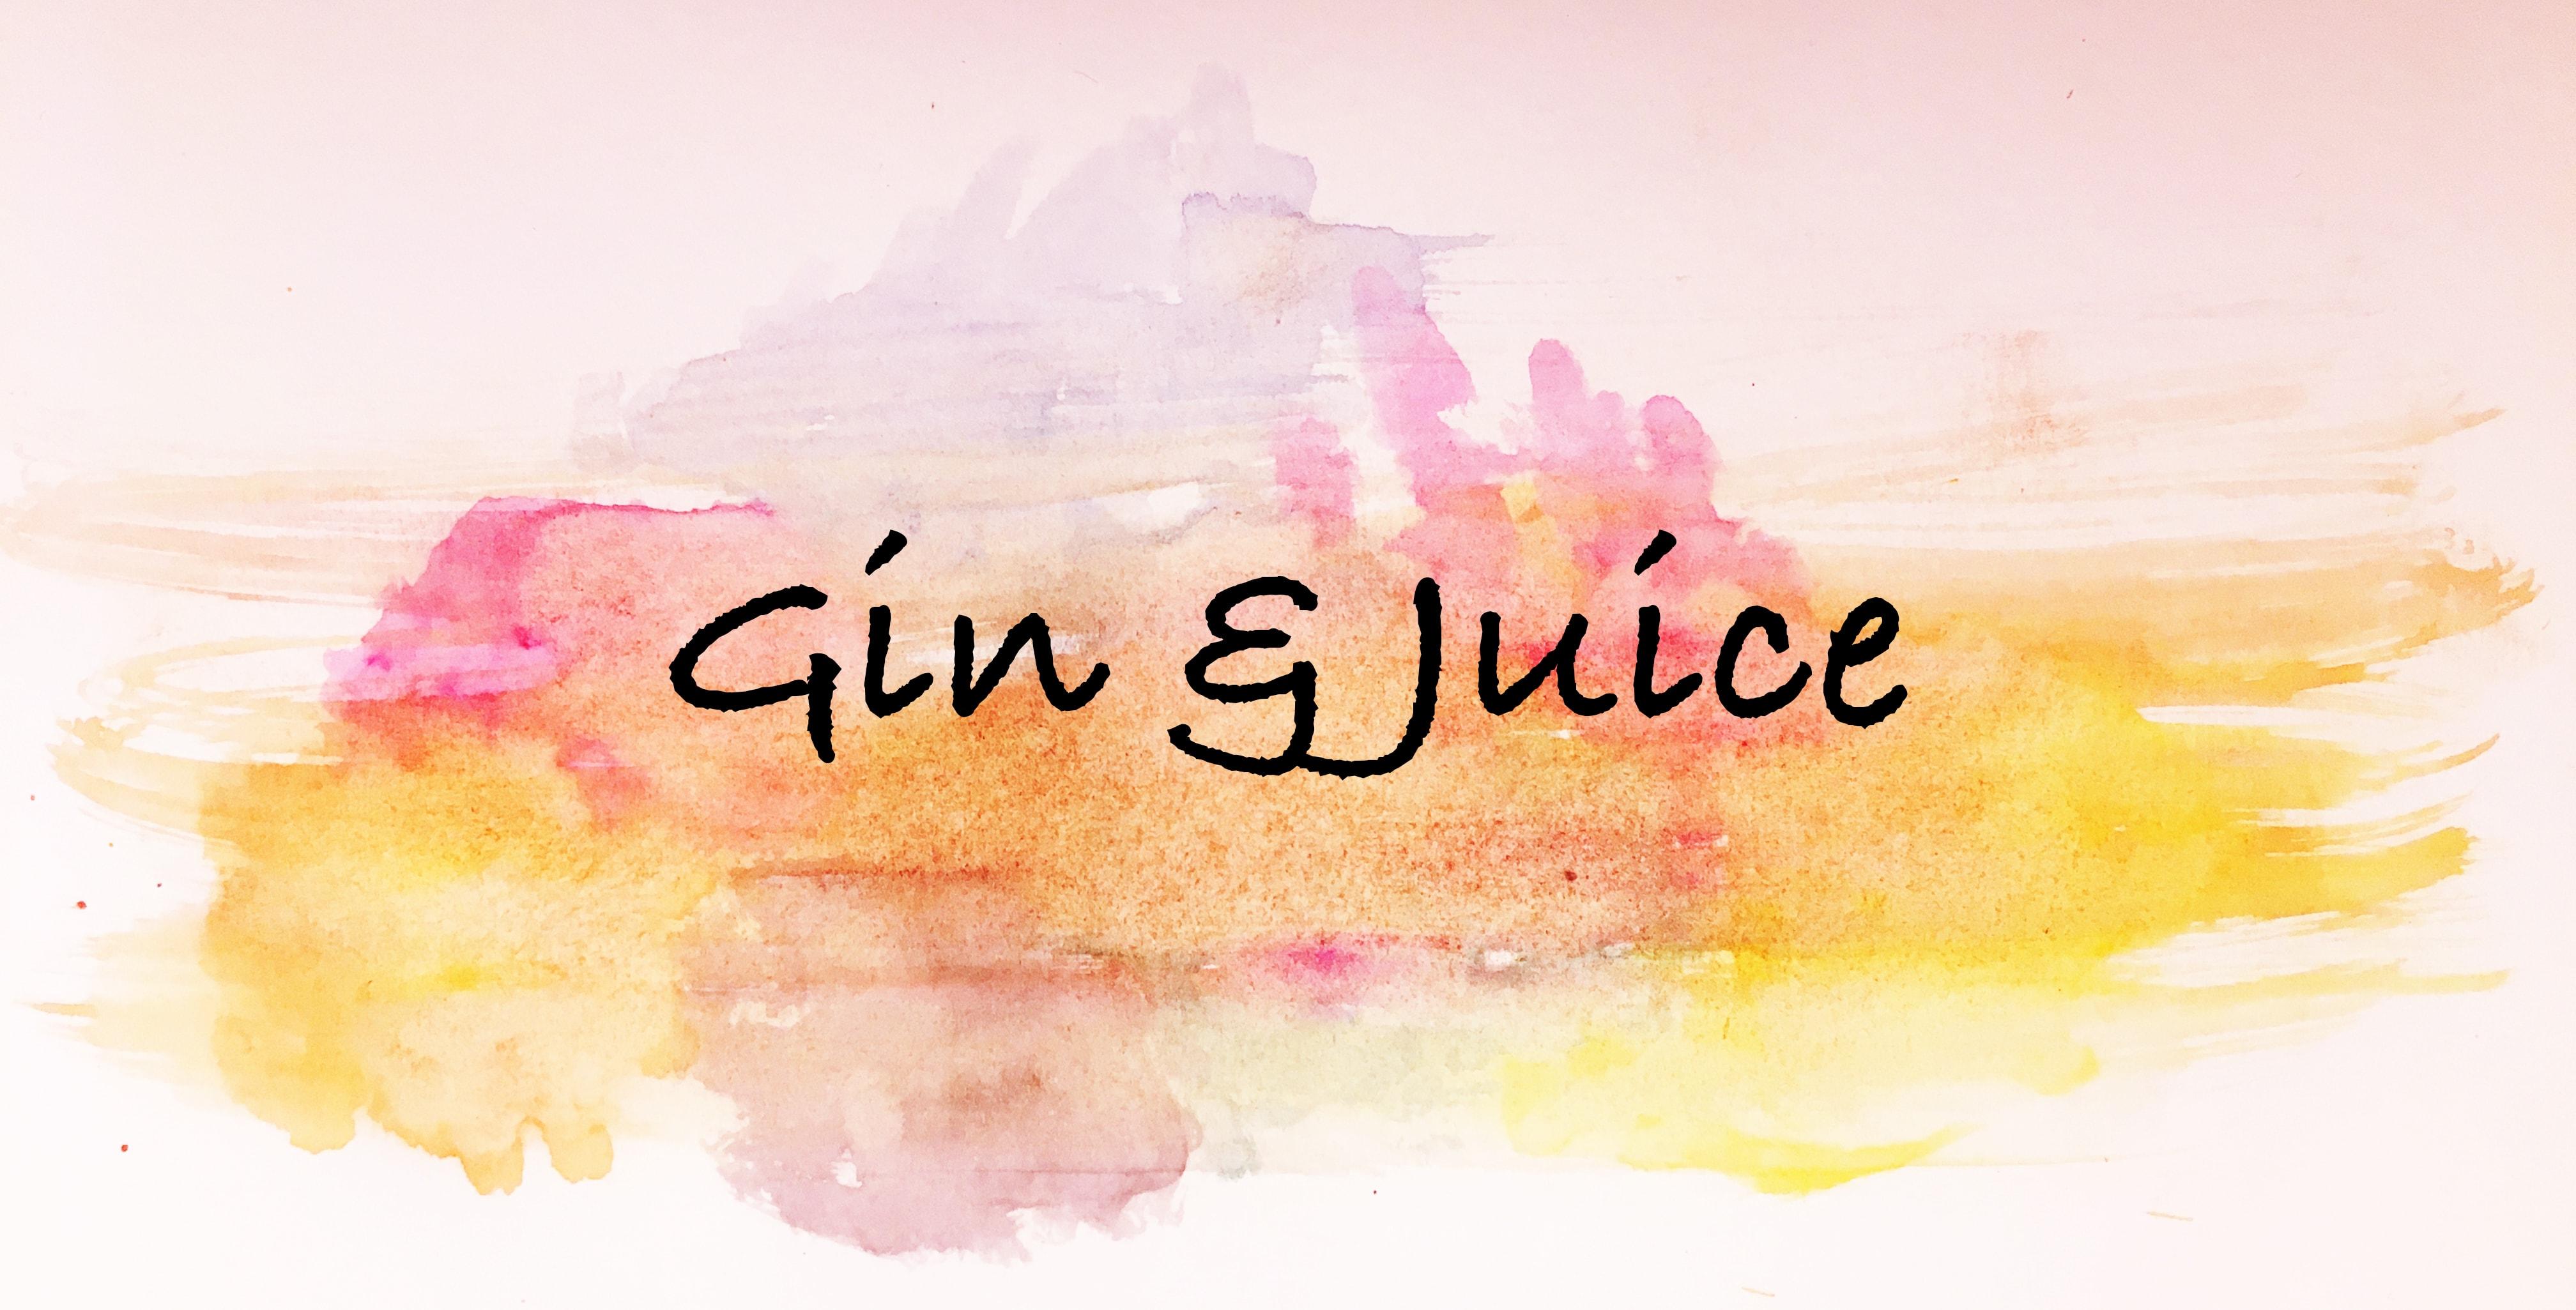 Die Alternative zu Gin Tonic: Gin & Juice mit THE DUKE Munich Dry Gin (Illustration: Paula Vogel)